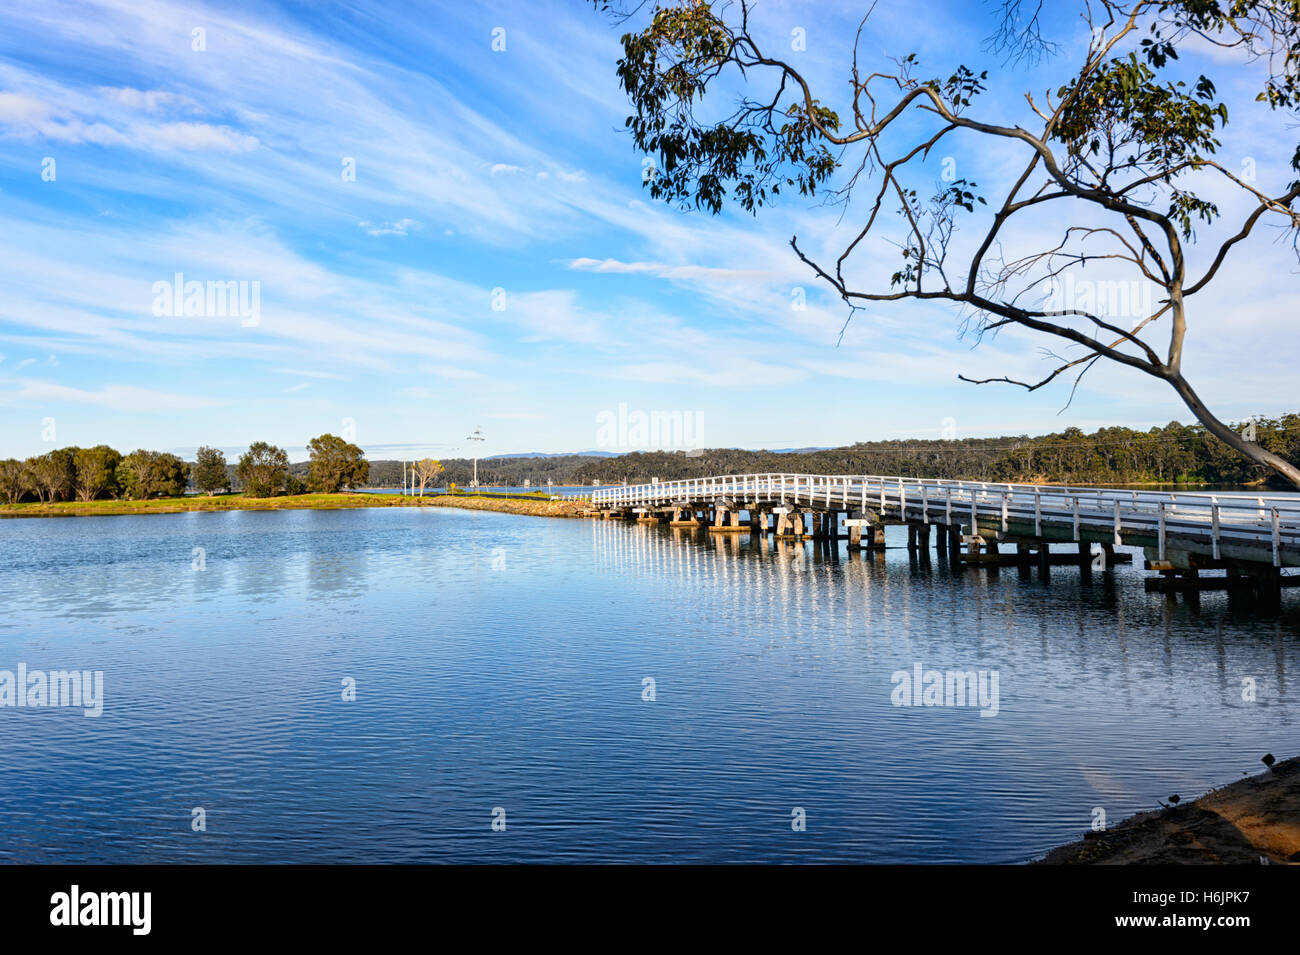 Scenic view of Wallaga Lake near Bermagui, New South Wales, NSW, Australia - Stock Image